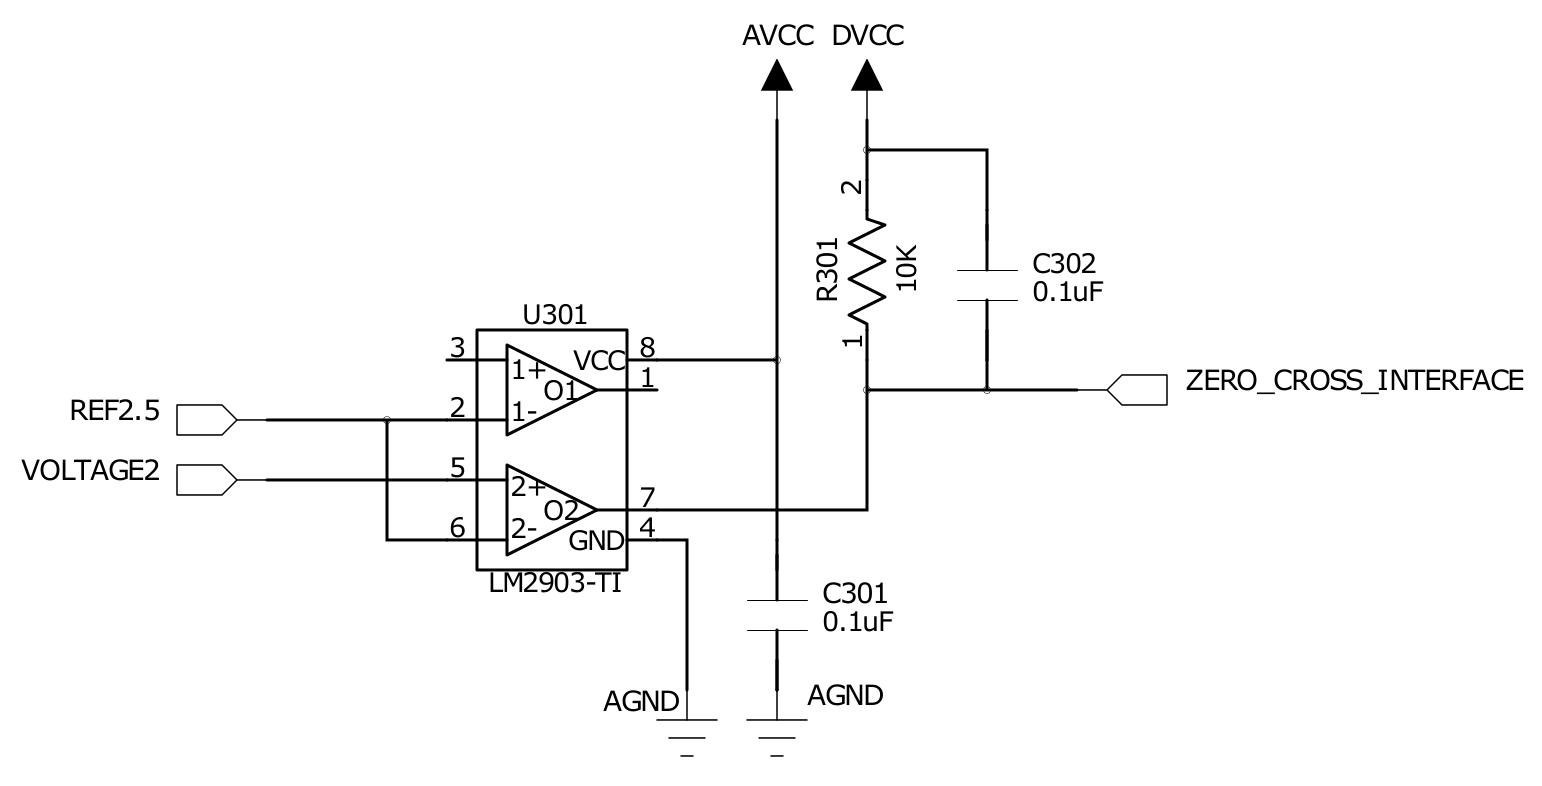 medium resolution of 4 1 3 zero crossing detectorschematic of the zero crossing detector circuit